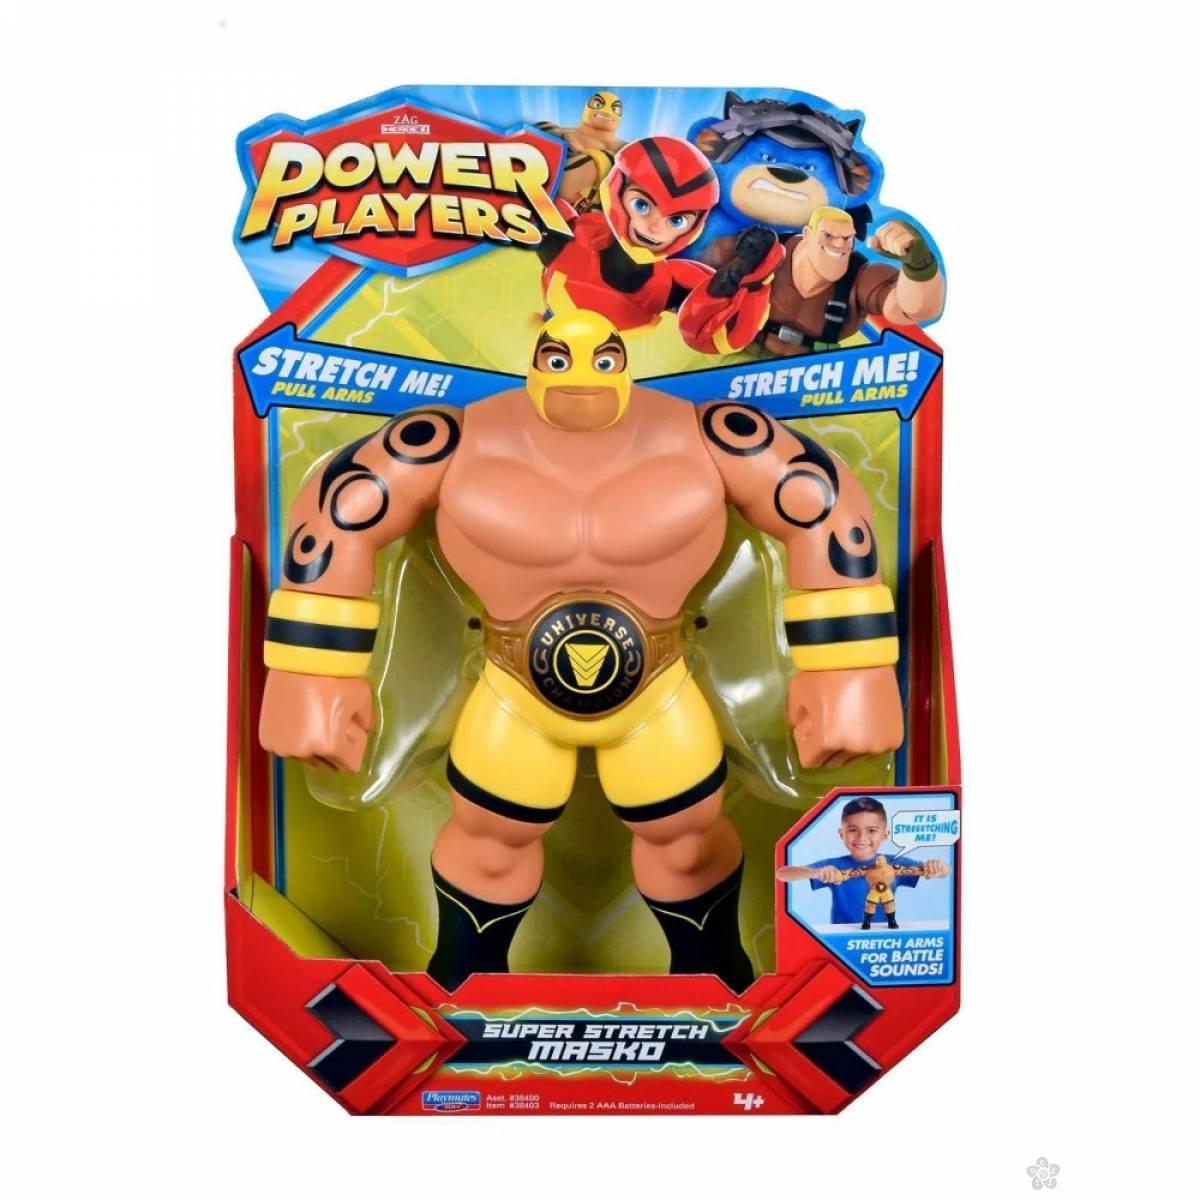 Akciona figrura velika Power Players Masko 38403